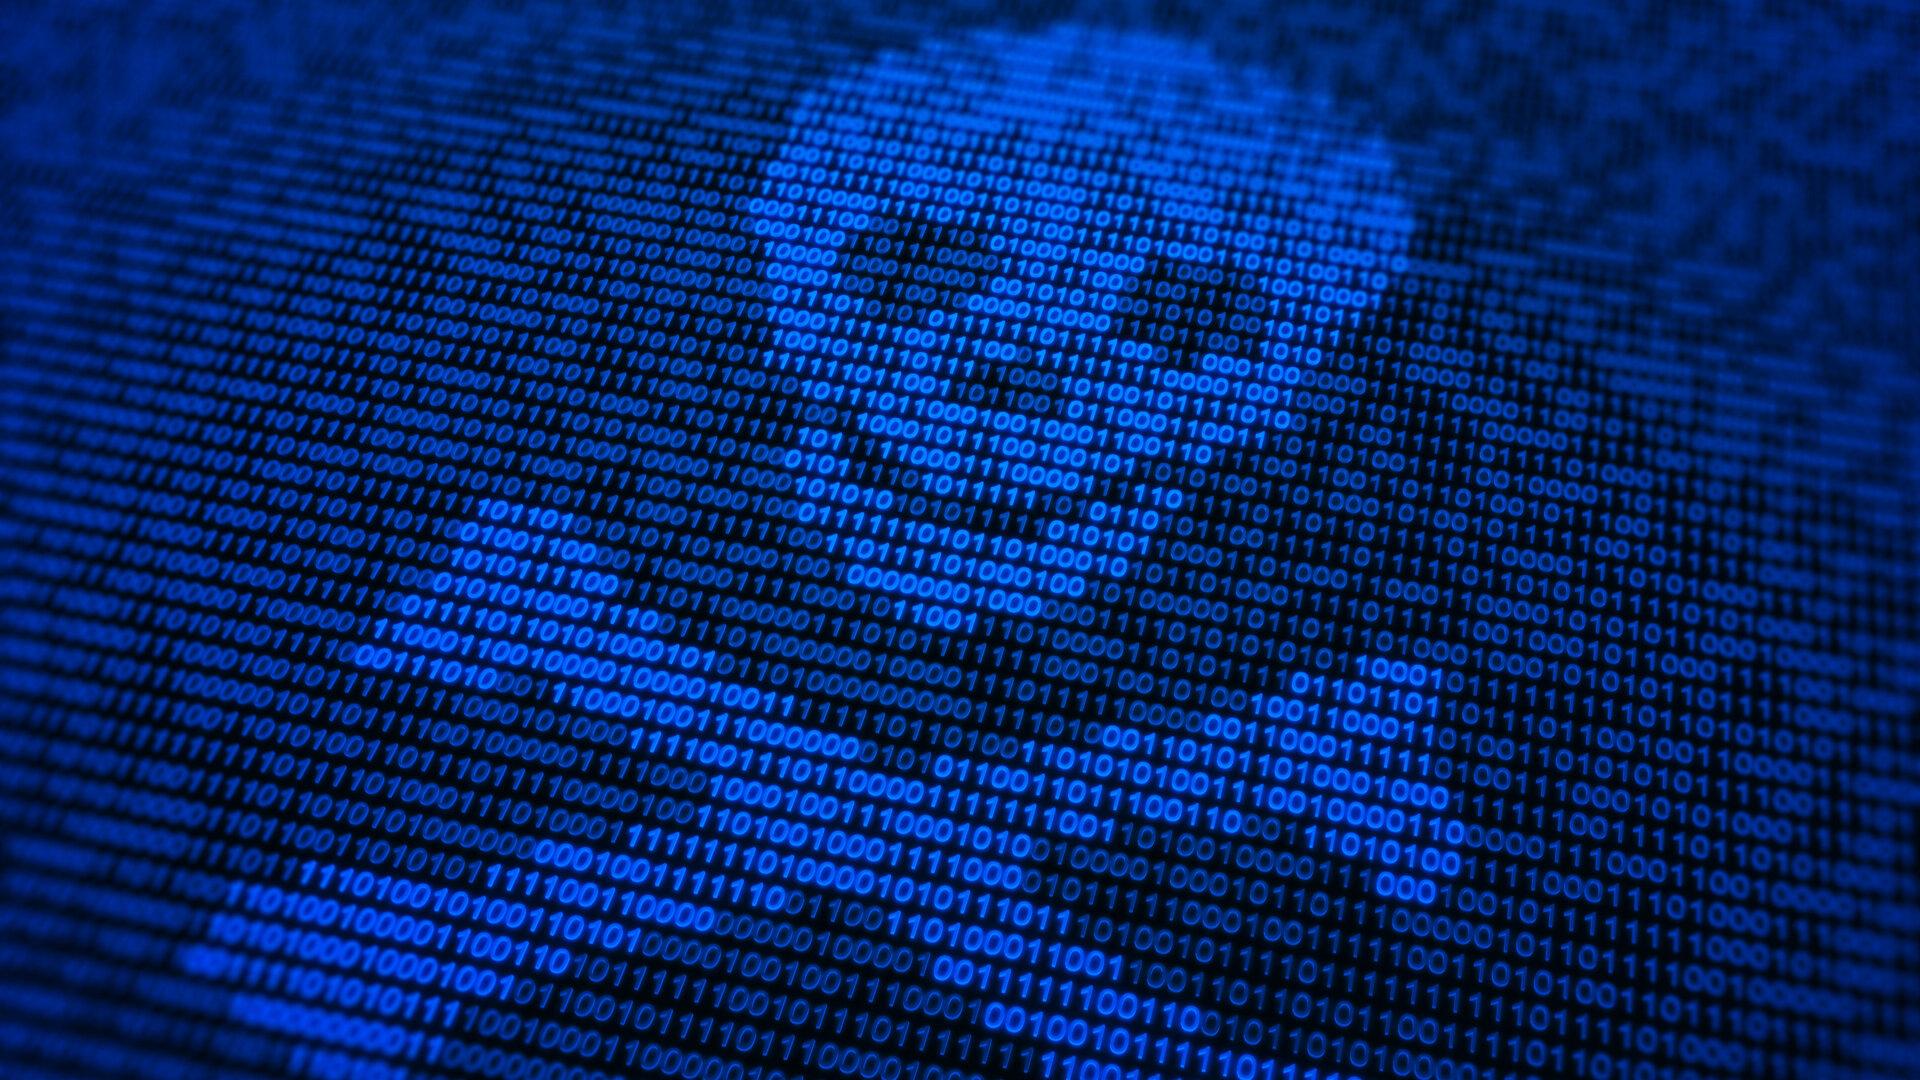 Fb Cute Wallpaper 1920x1080 Skull Hacker Laptop Full Hd 1080p Hd 4k